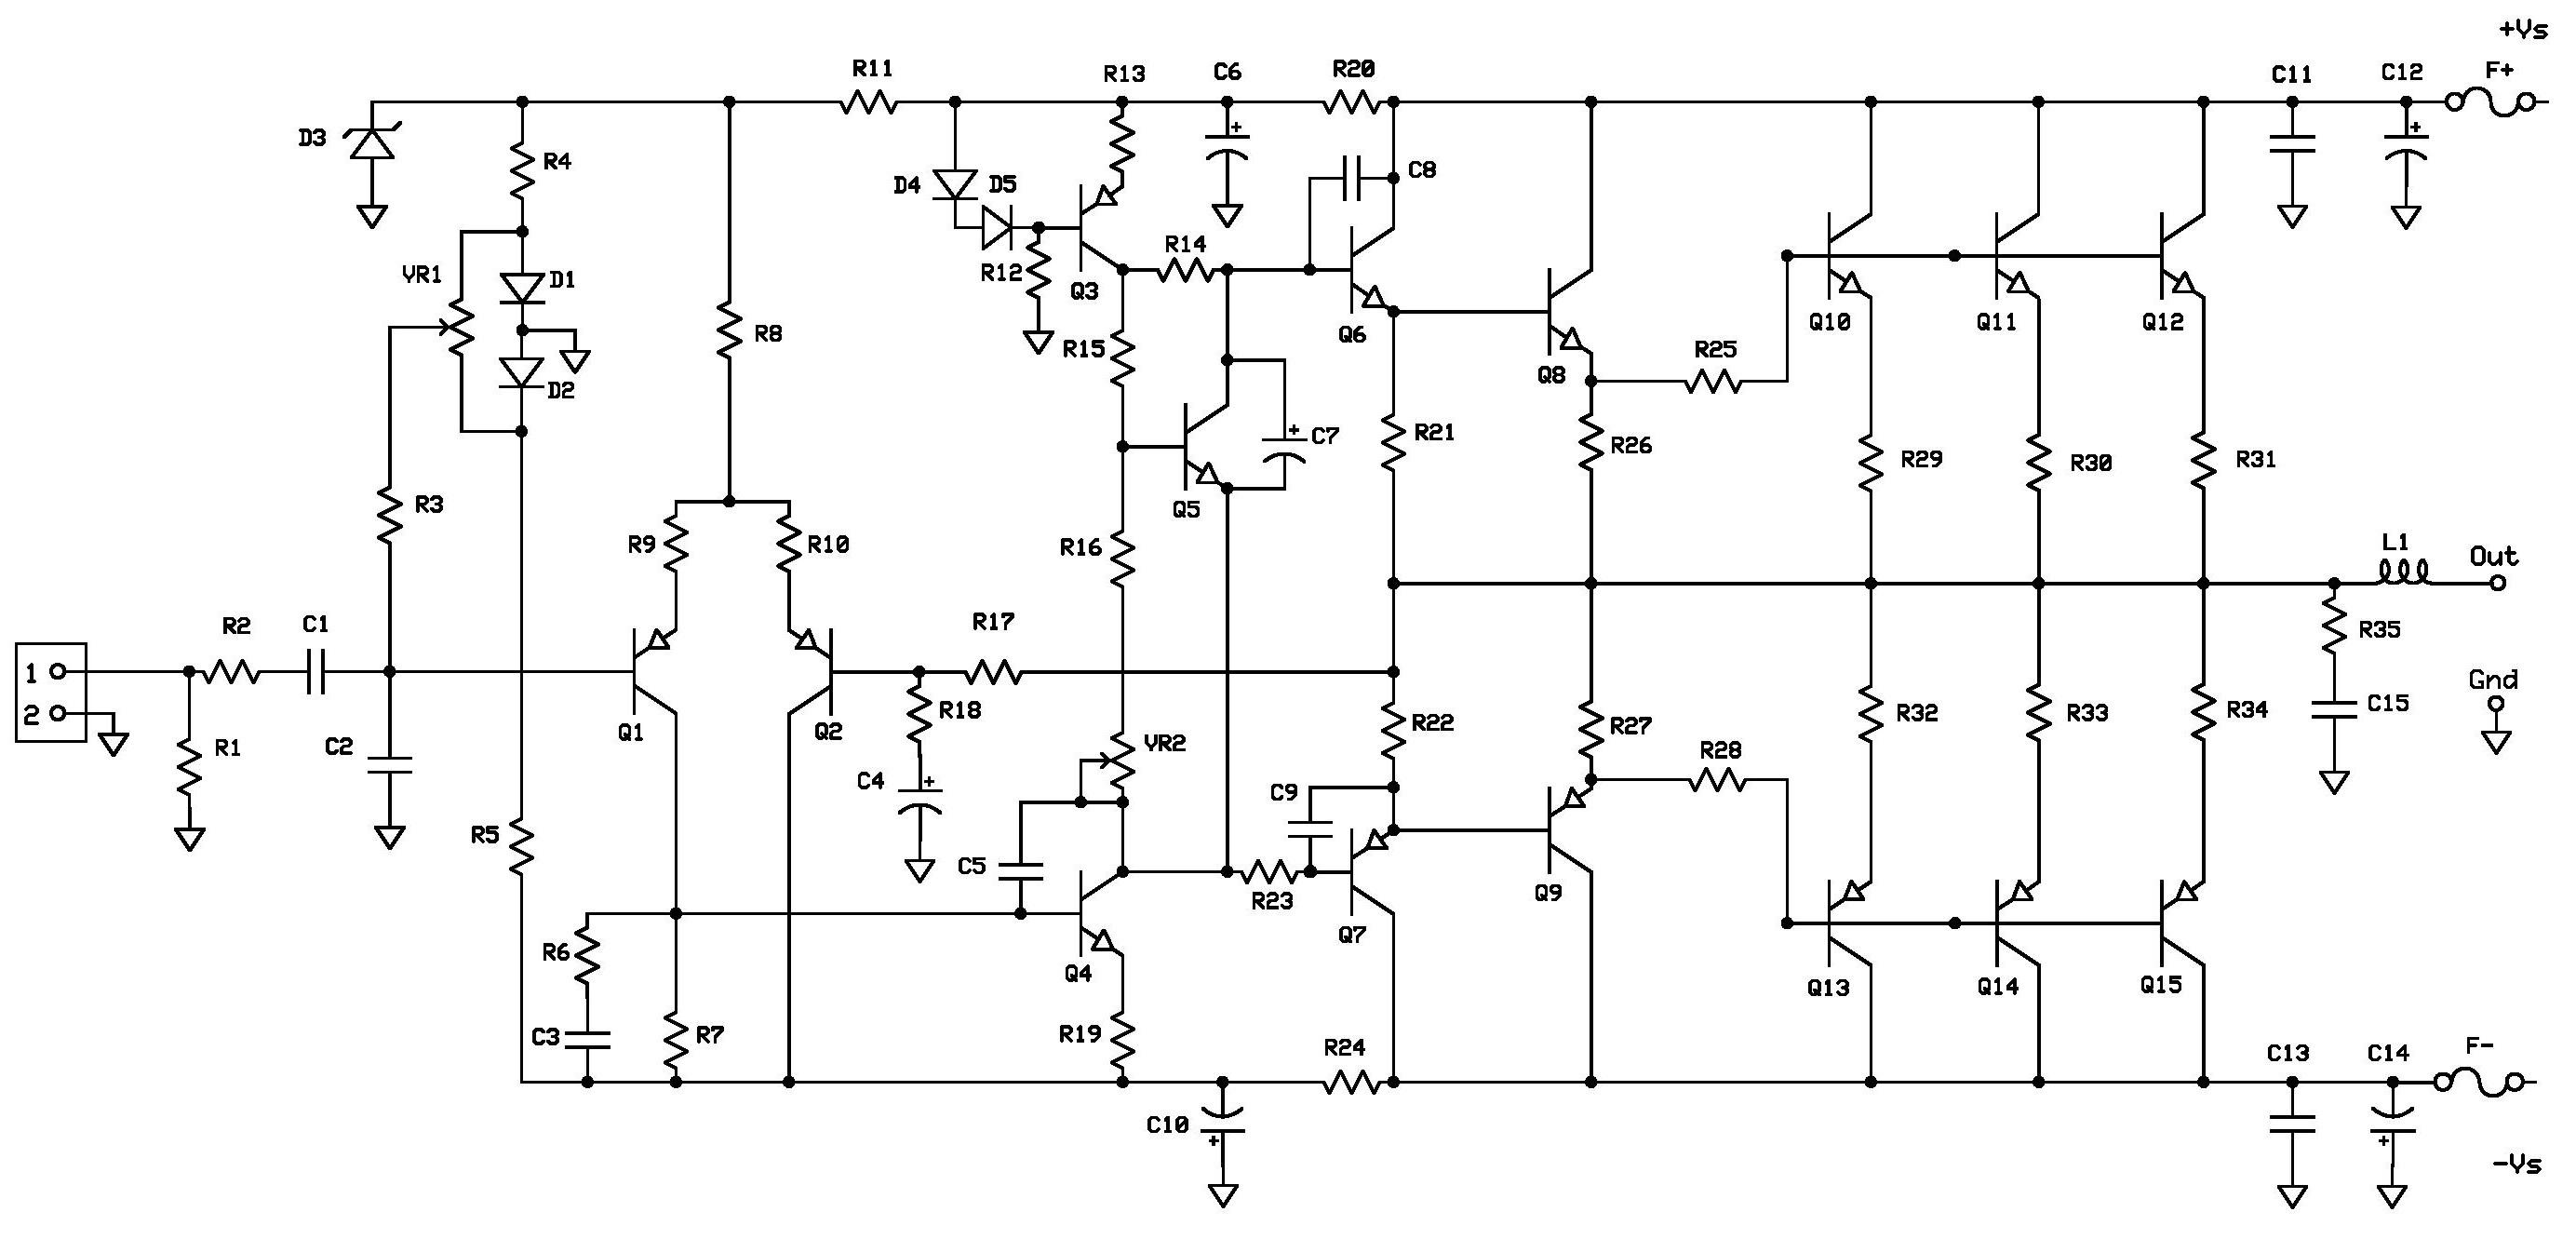 100w subwoofer amplifier circuit diagram morris minor wiring tda2030 audio schematic diagrams power get